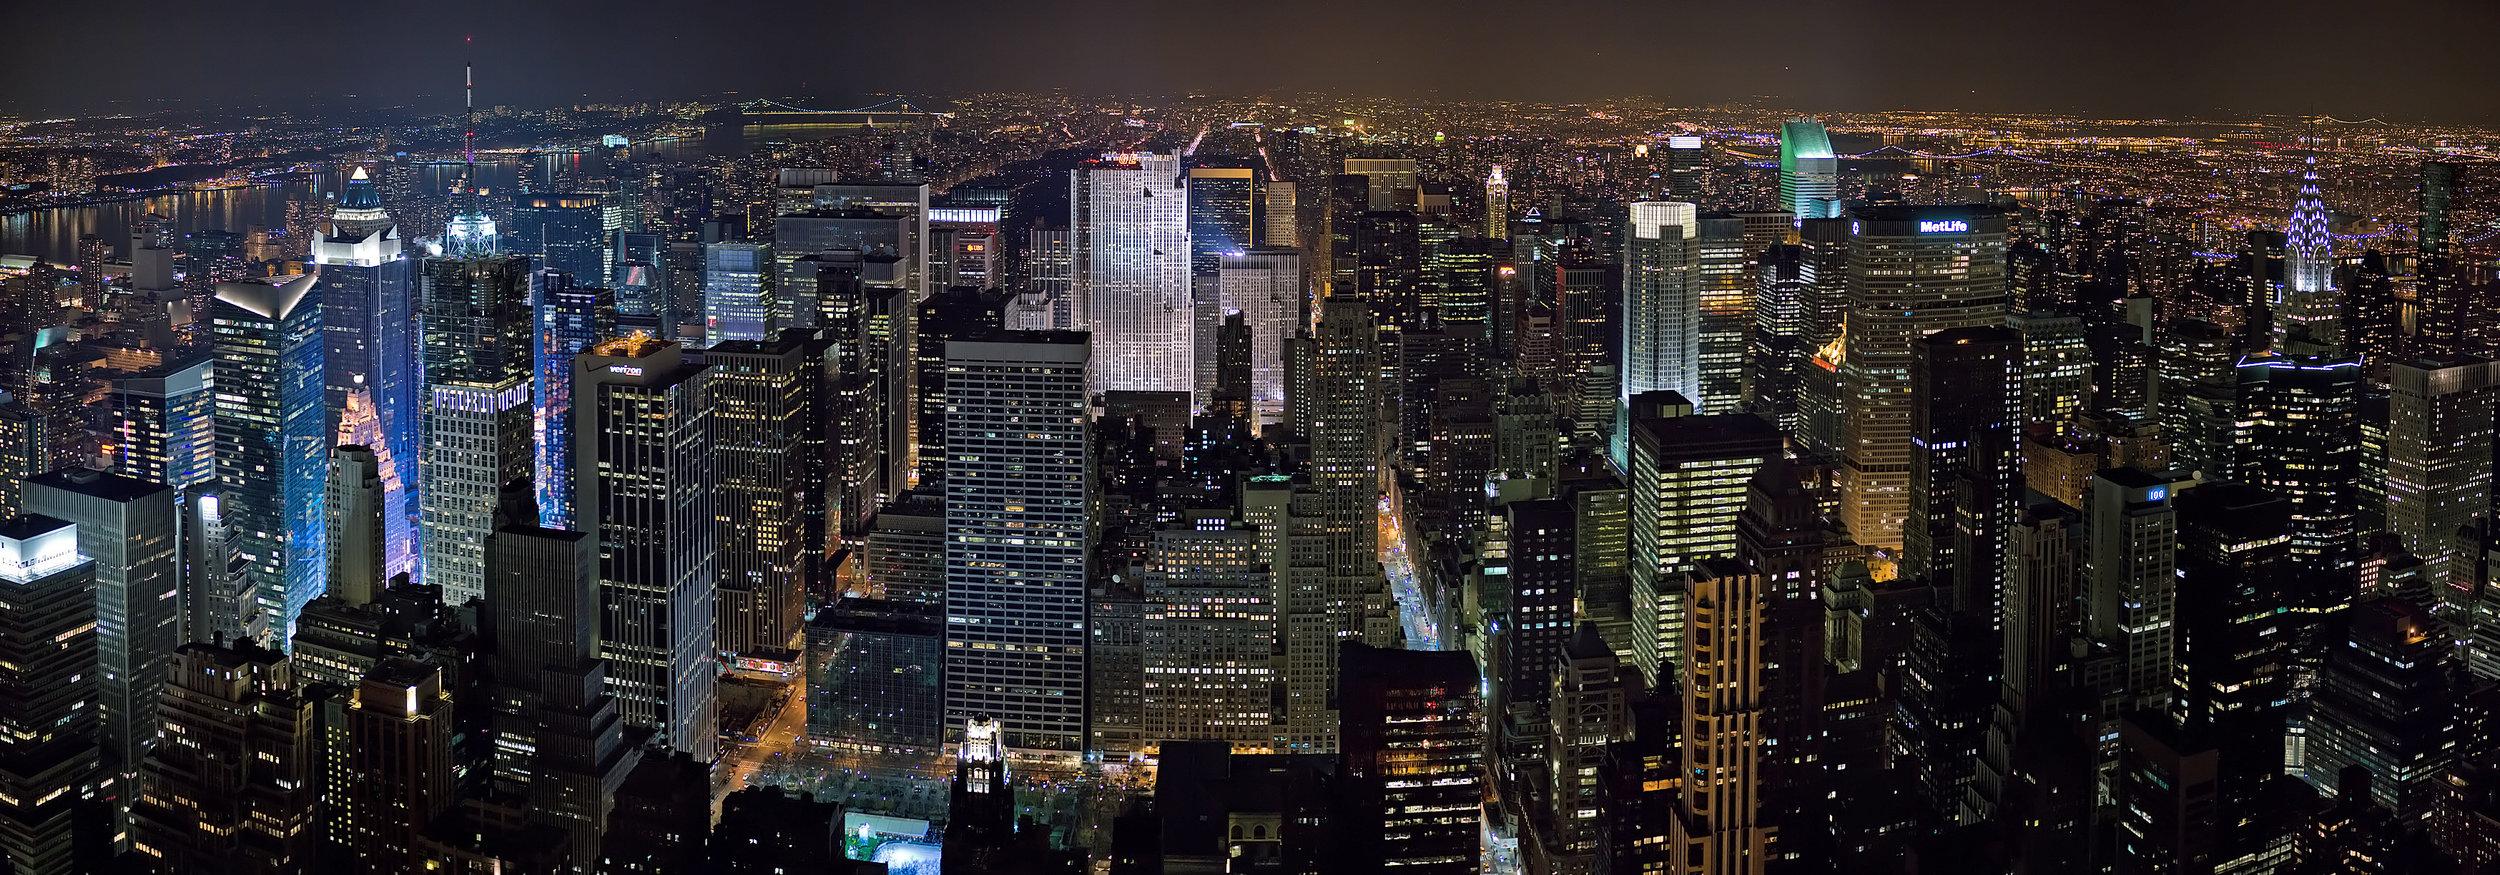 New_York_Midtown_Skyline_at_night_-_Jan_2006_edit1.jpg